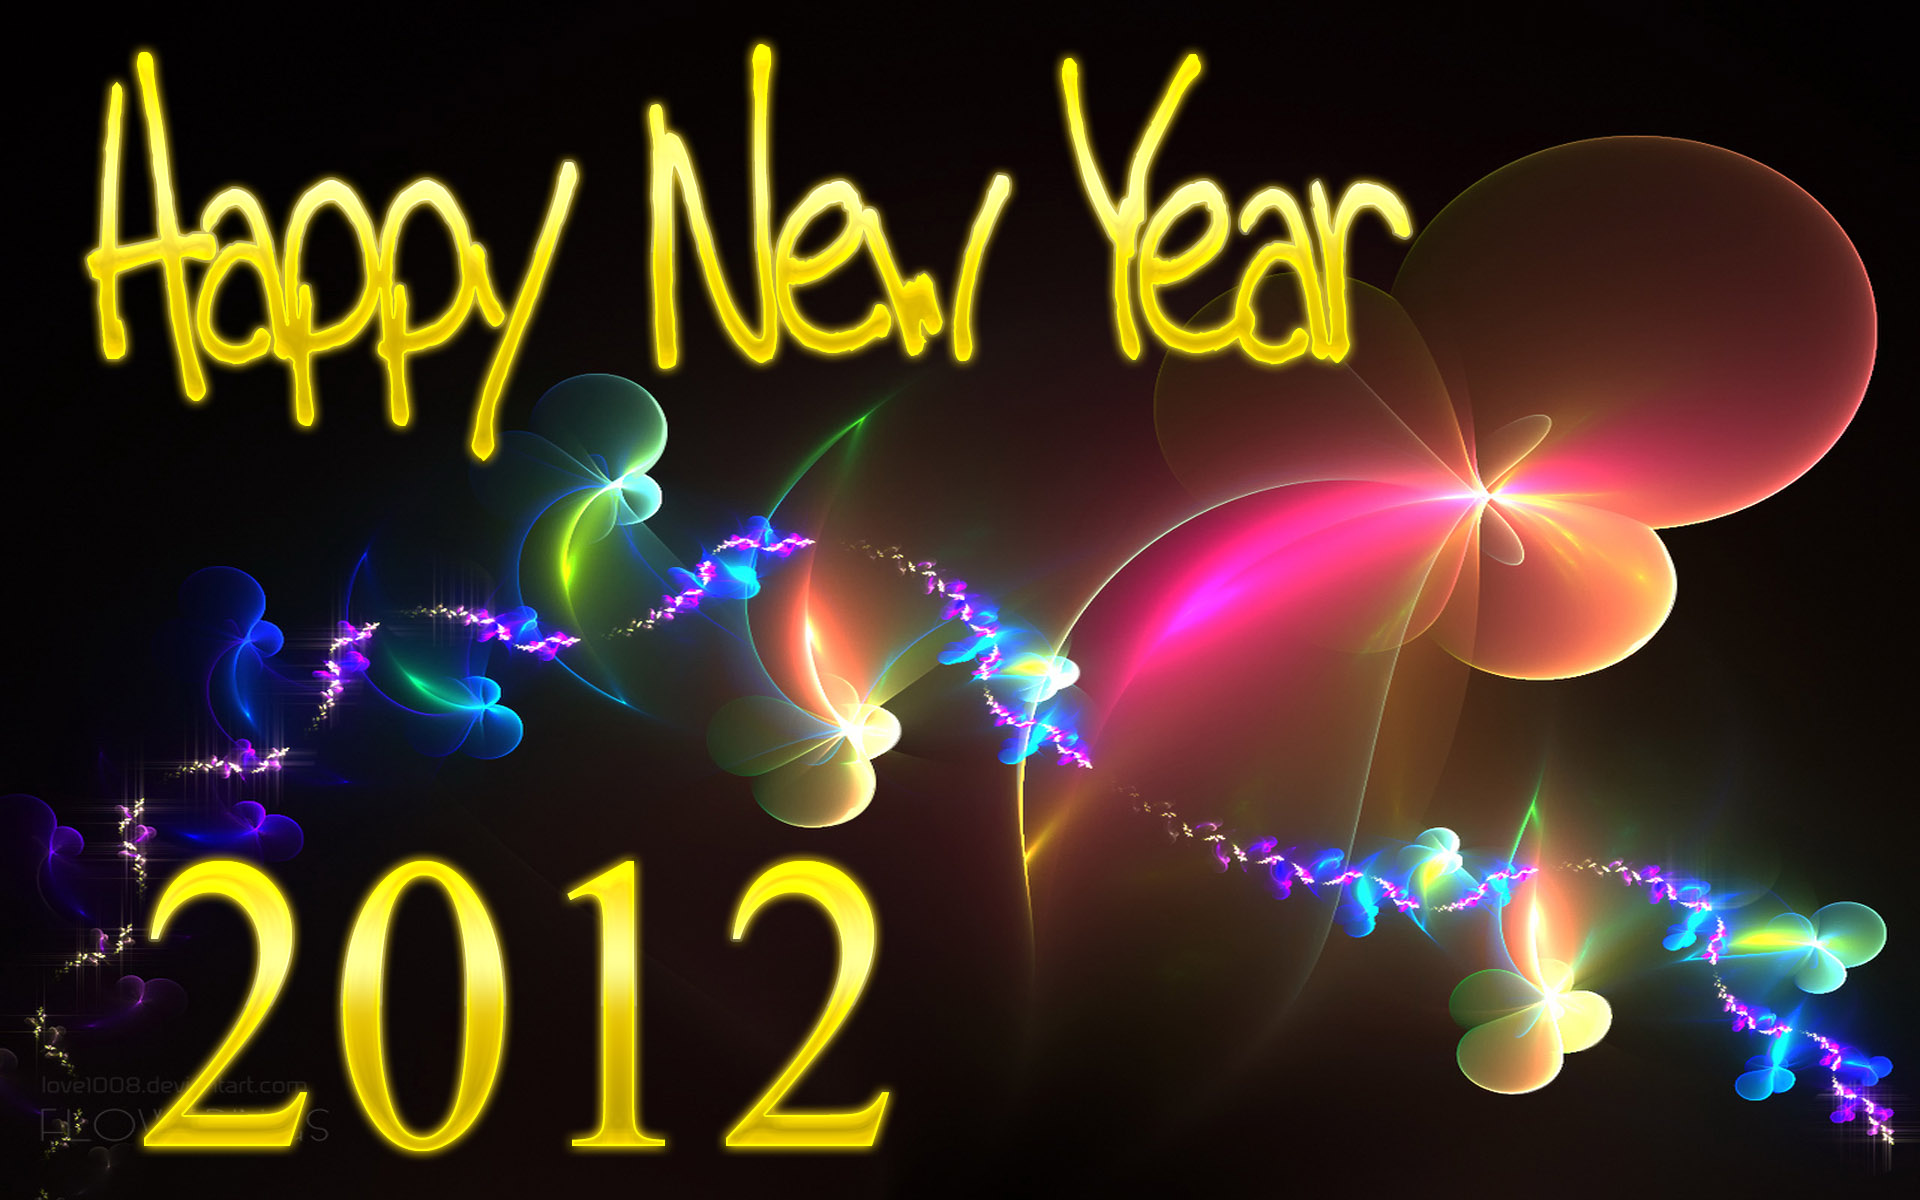 Happy New Year 2012 HD Wallpaper